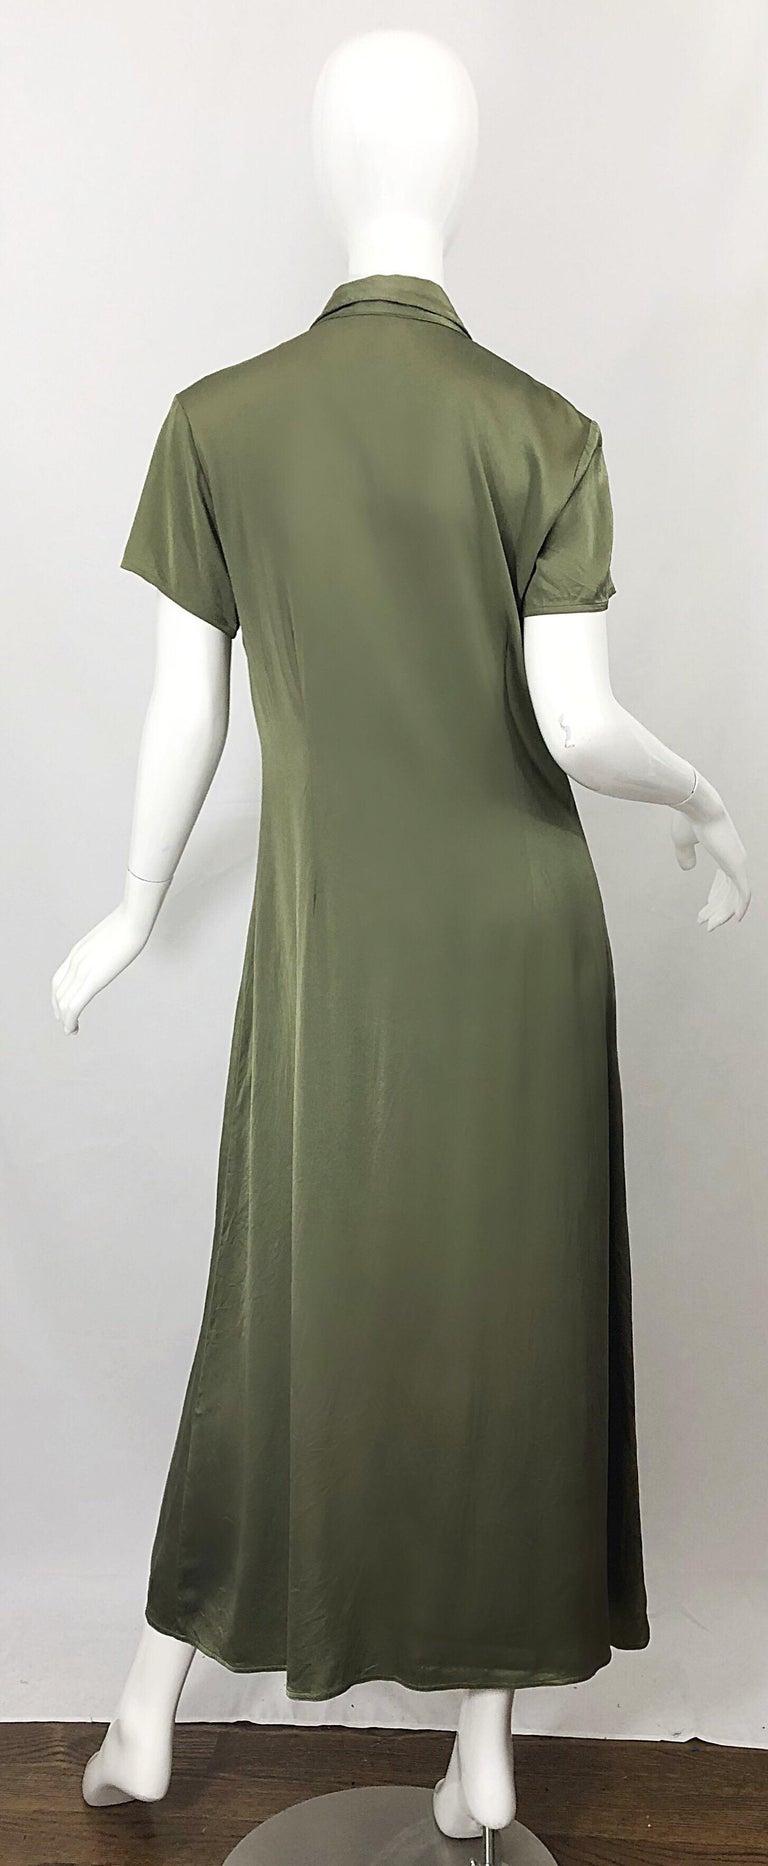 Women's 1970s Halston Olive Green Liquid Silk Vintage 70s Short Sleeve Maxi Shirt Dress For Sale